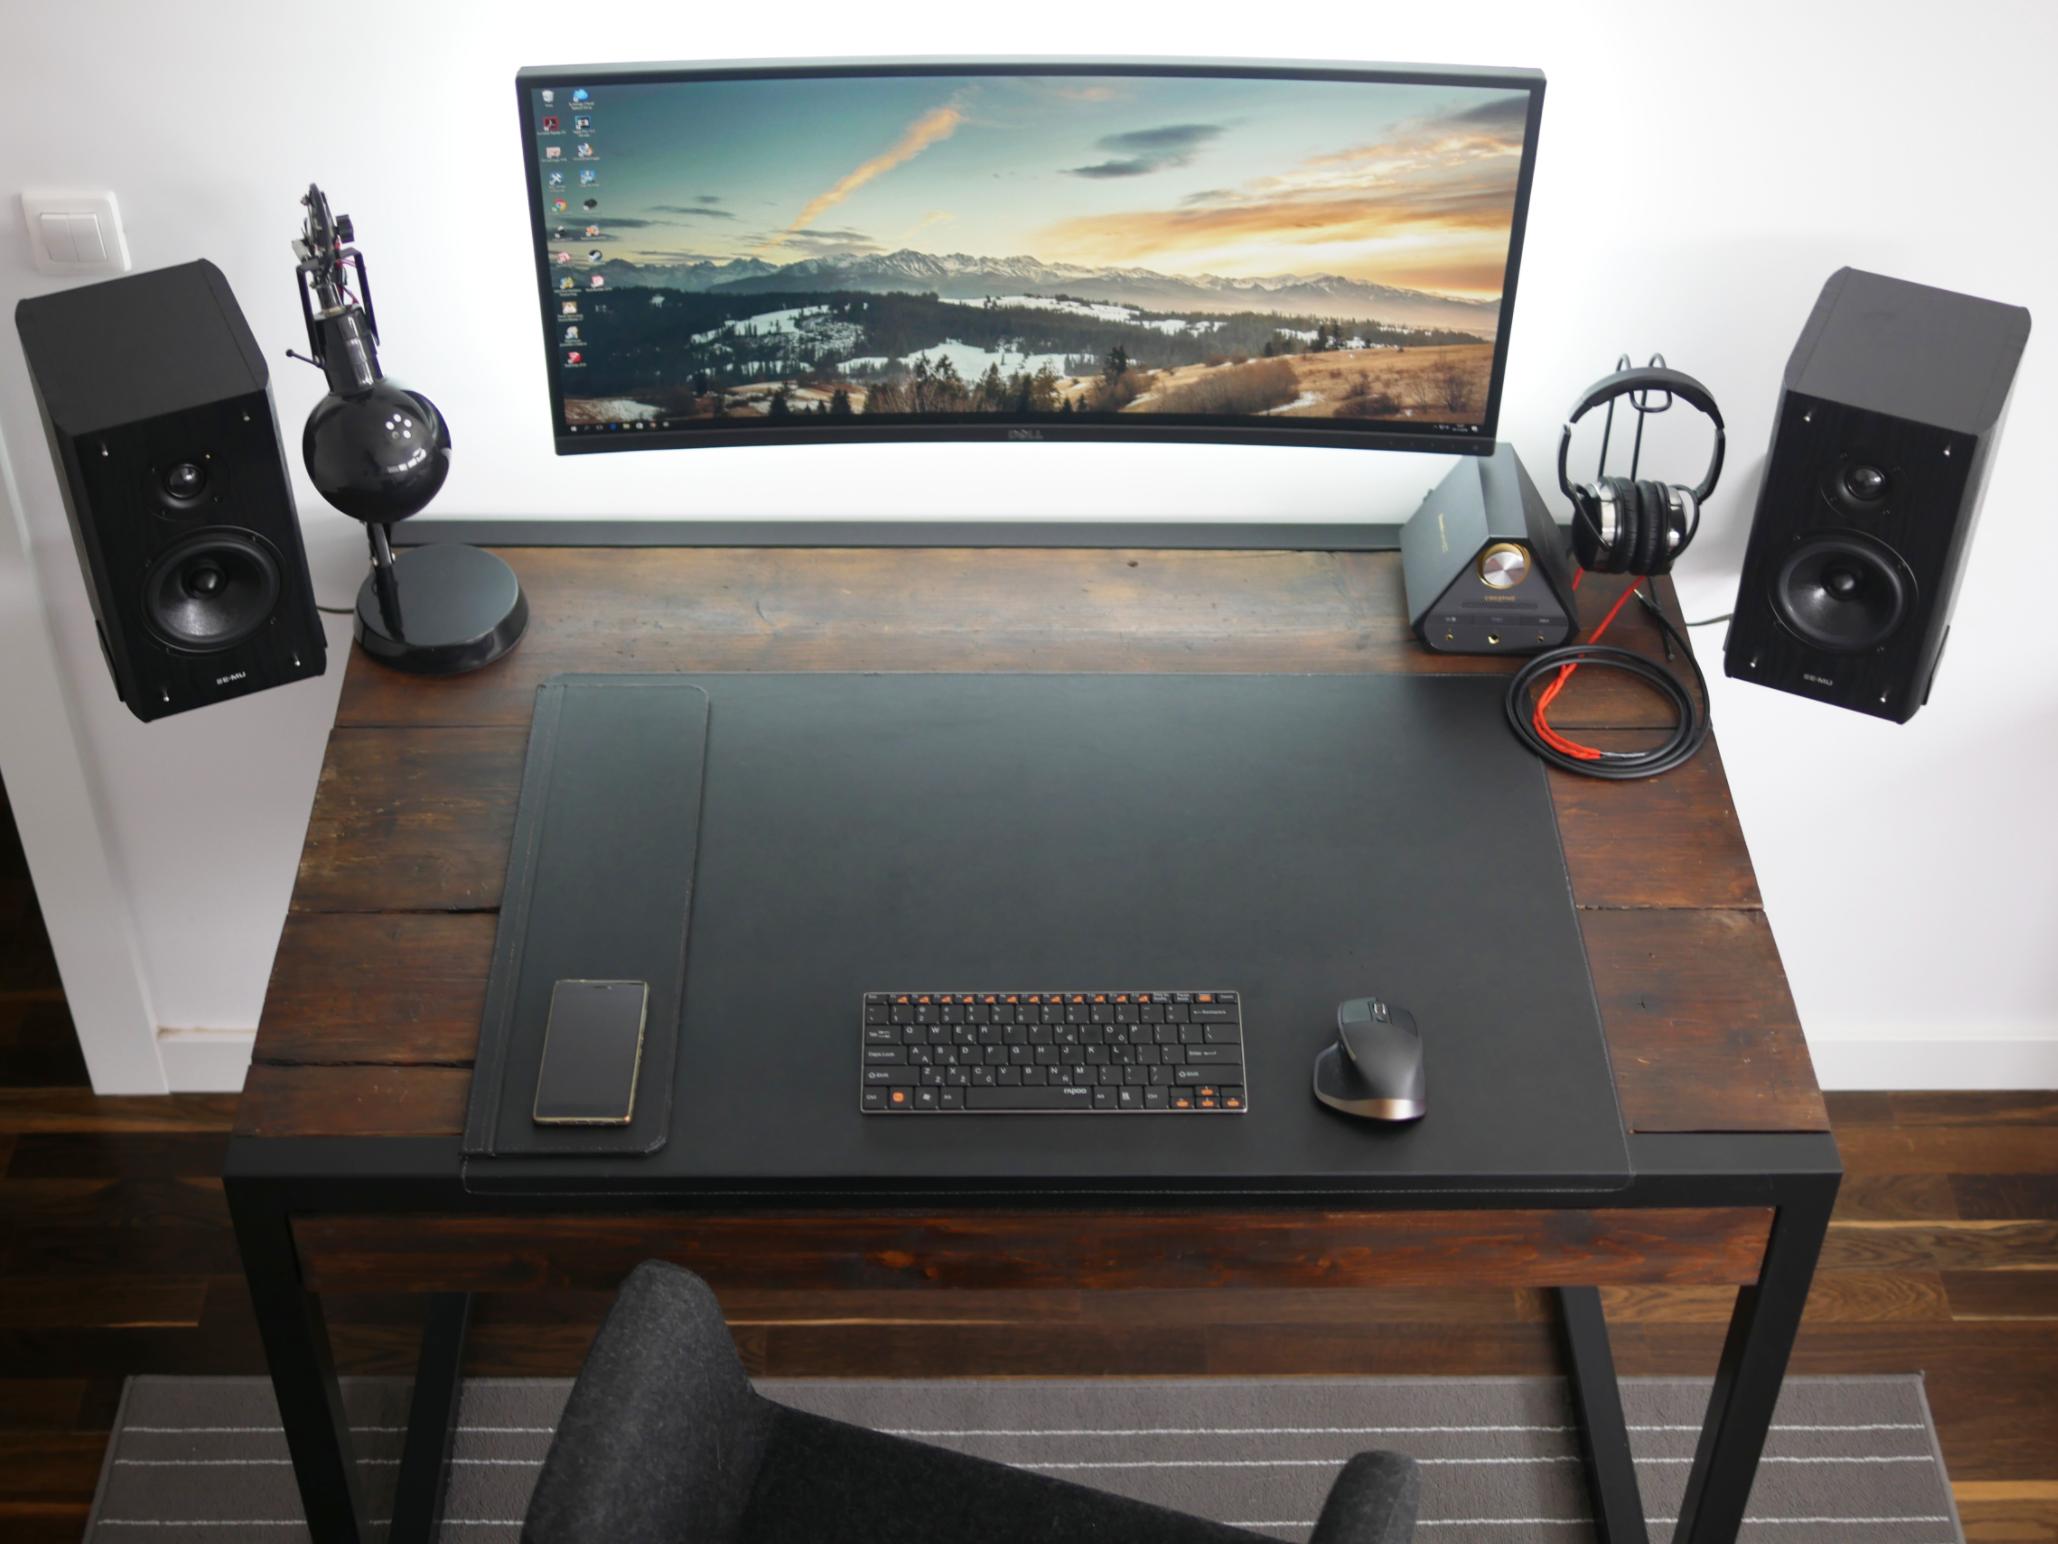 - Wooden Gaming Desk Ideas Computer Desk Setup, Work Space Decor